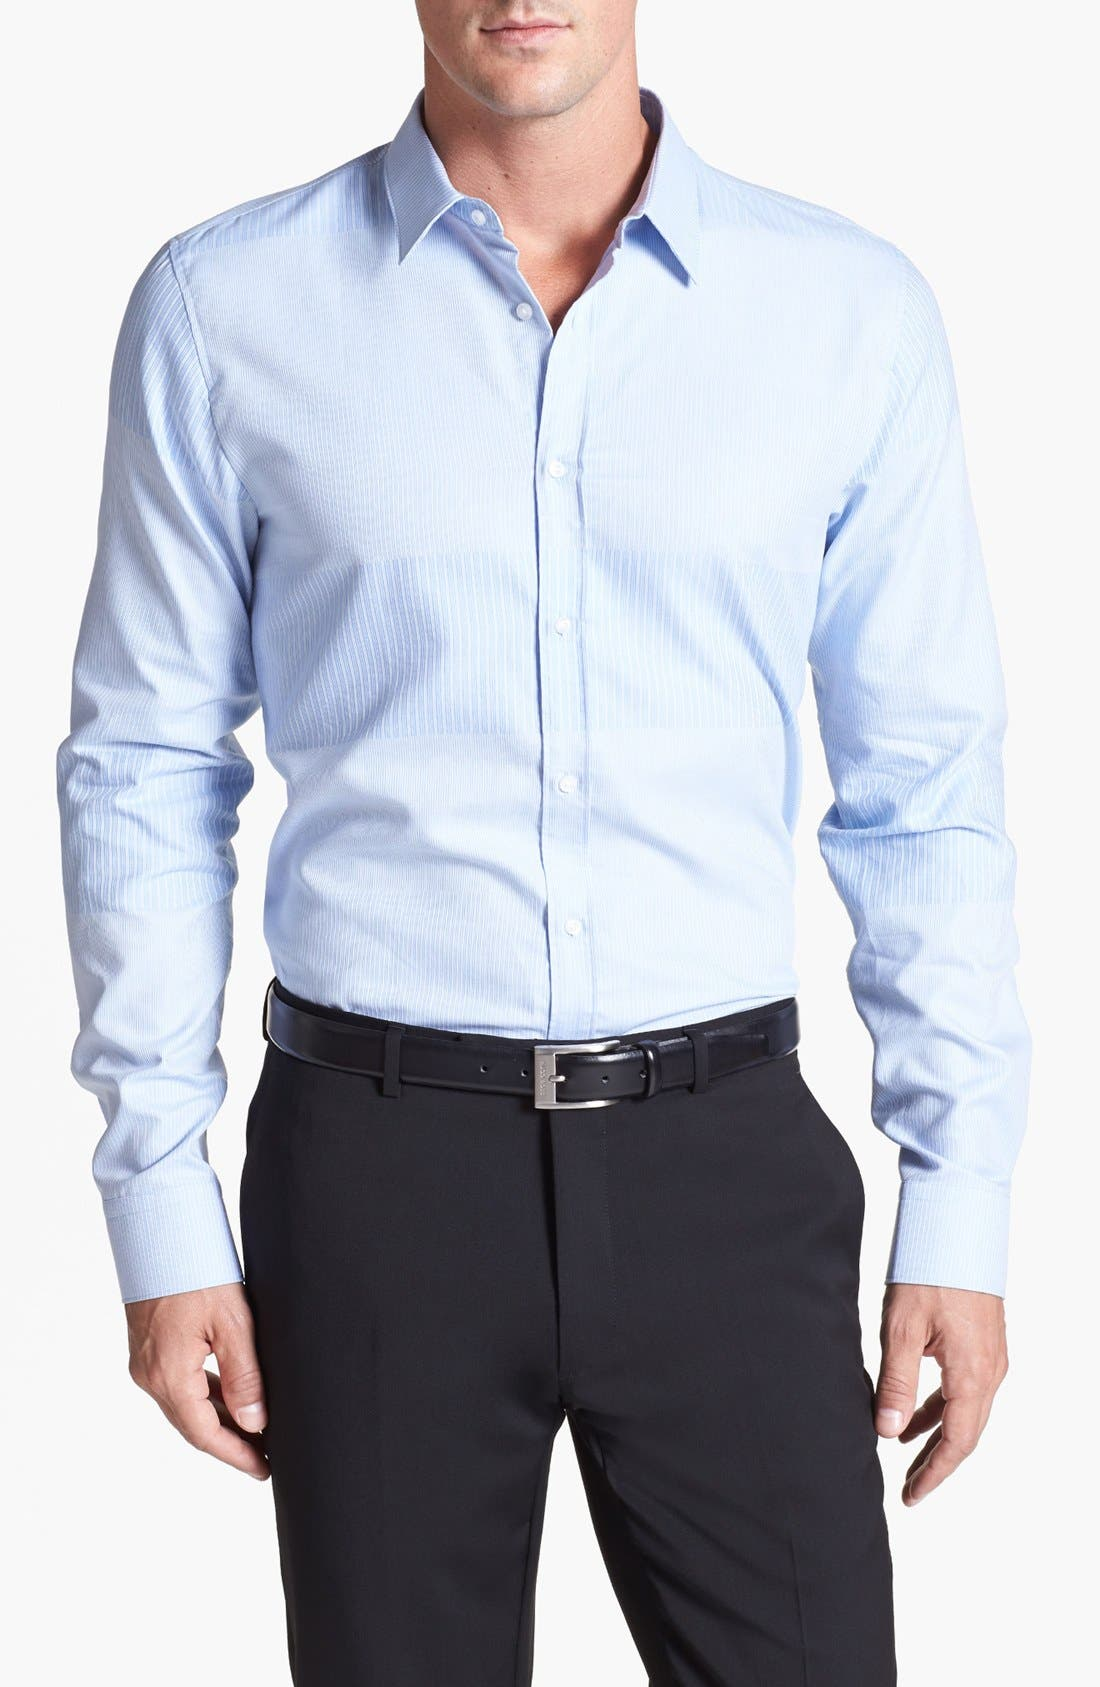 Alternate Image 1 Selected - HUGO 'Elisha' Trim Fit Sport Shirt